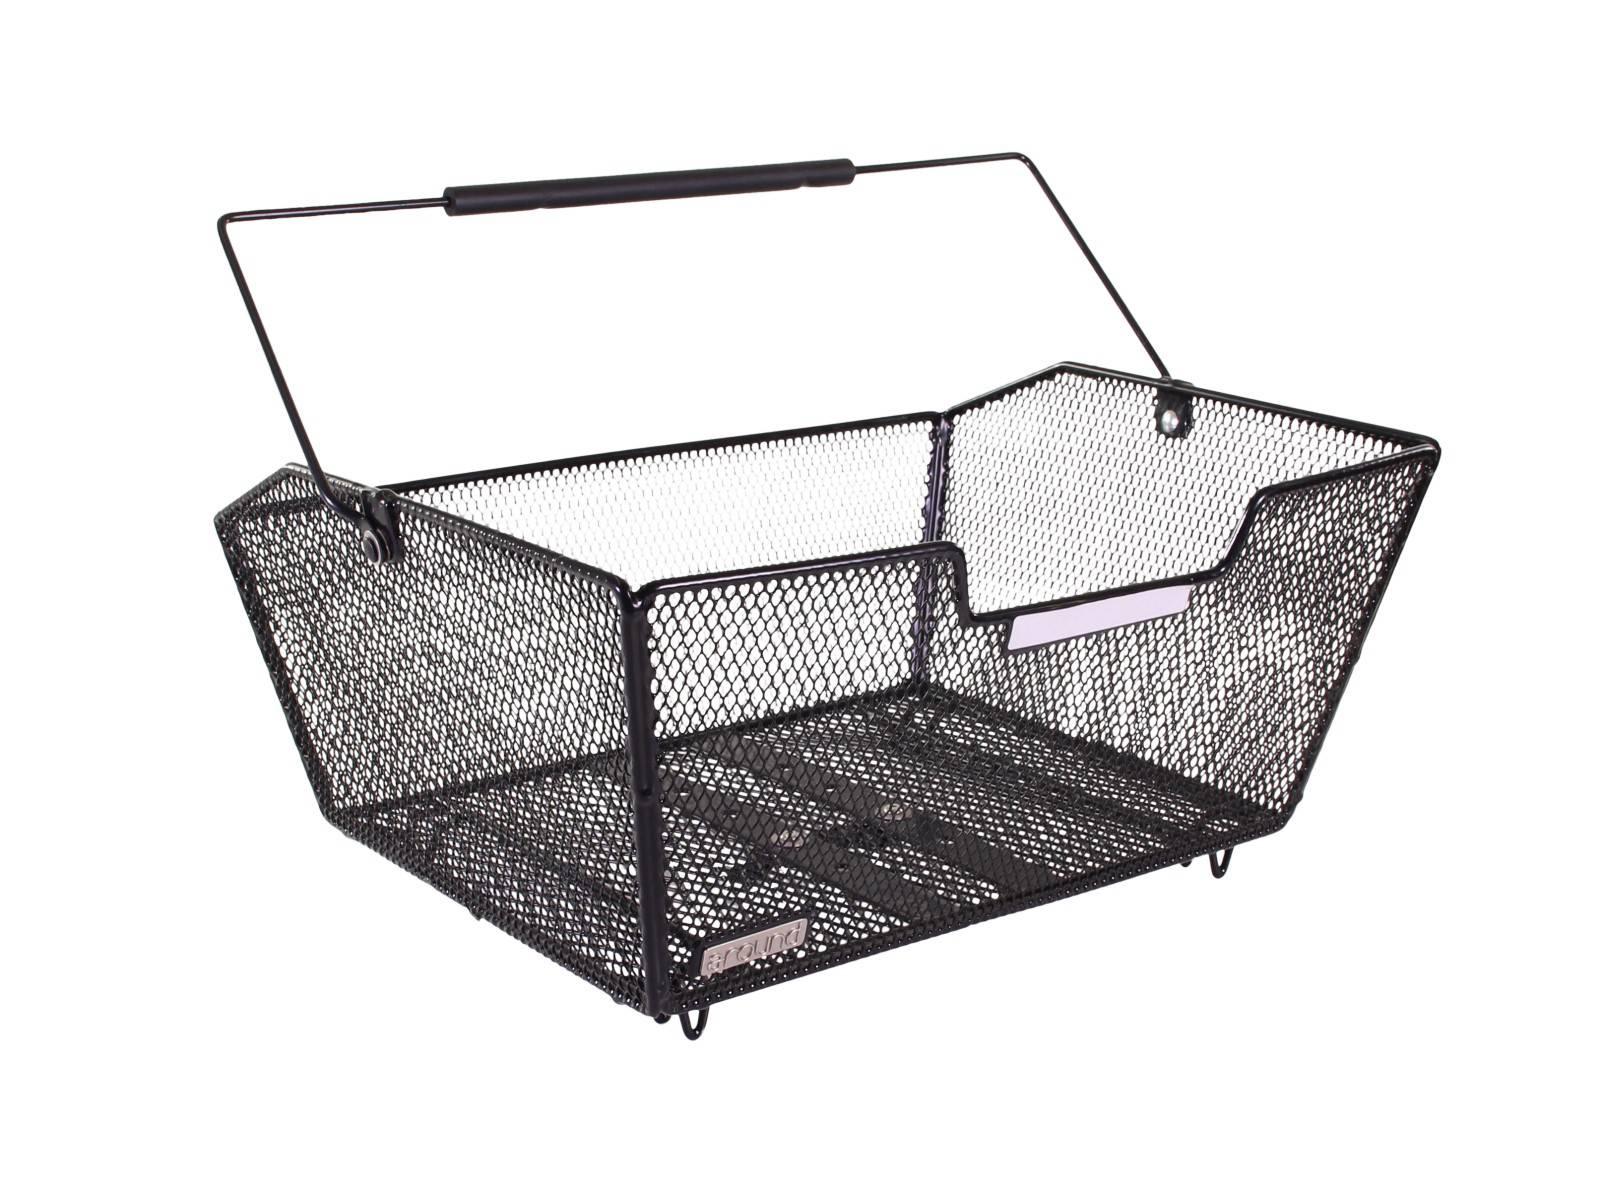 around fahrradkorb hinten fine comfort fahrradkomfort. Black Bedroom Furniture Sets. Home Design Ideas